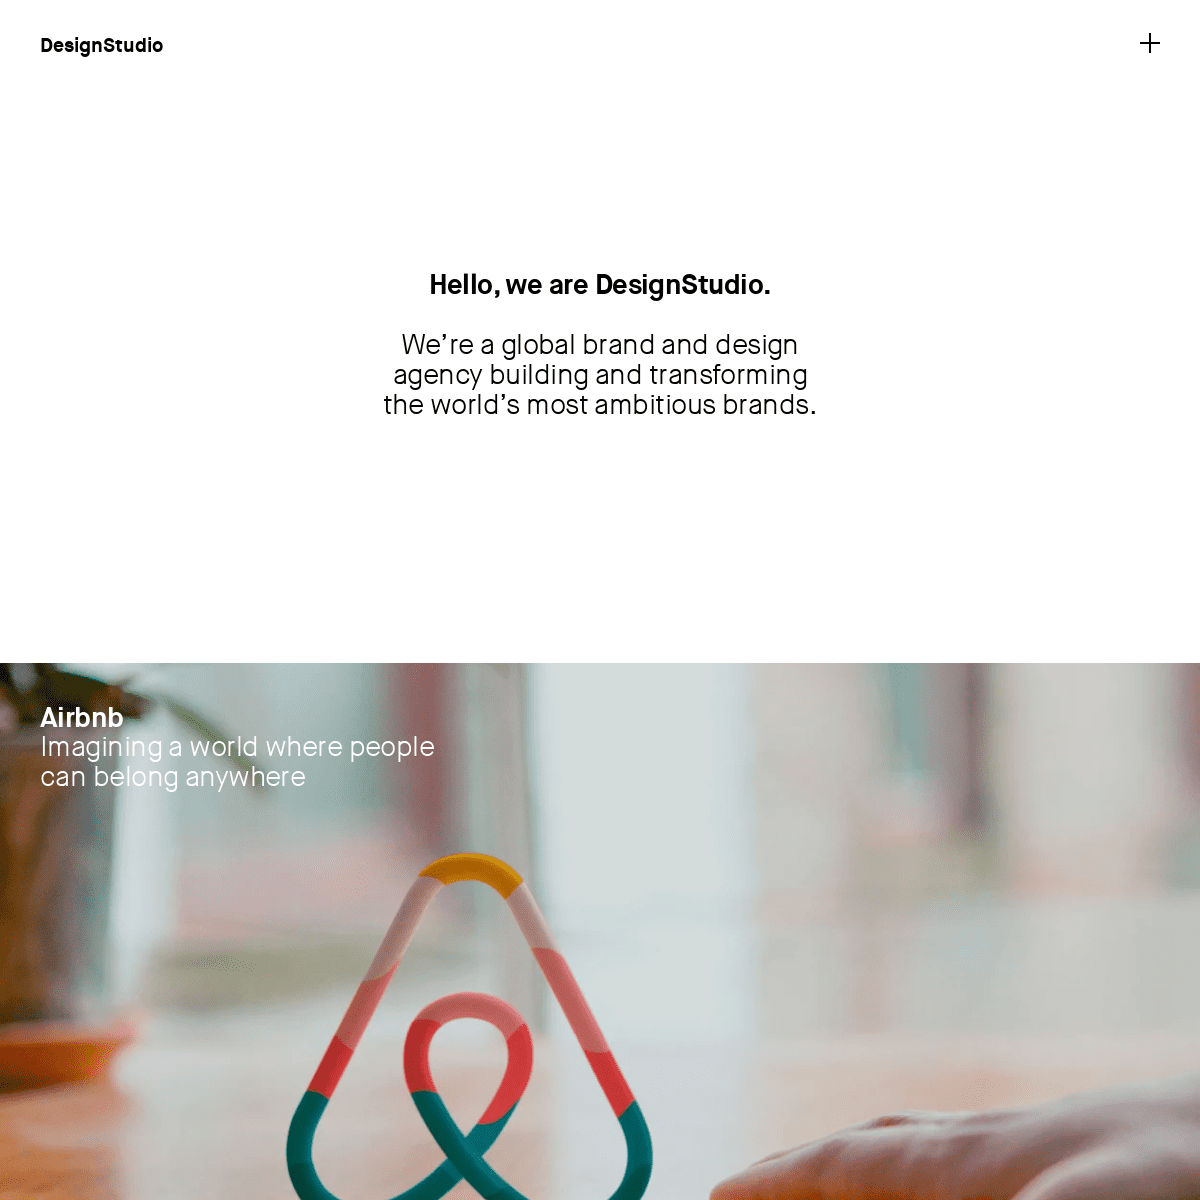 ArchiveBay.com - design.studio - Branding and Digital Creative Agency - DesignStudio